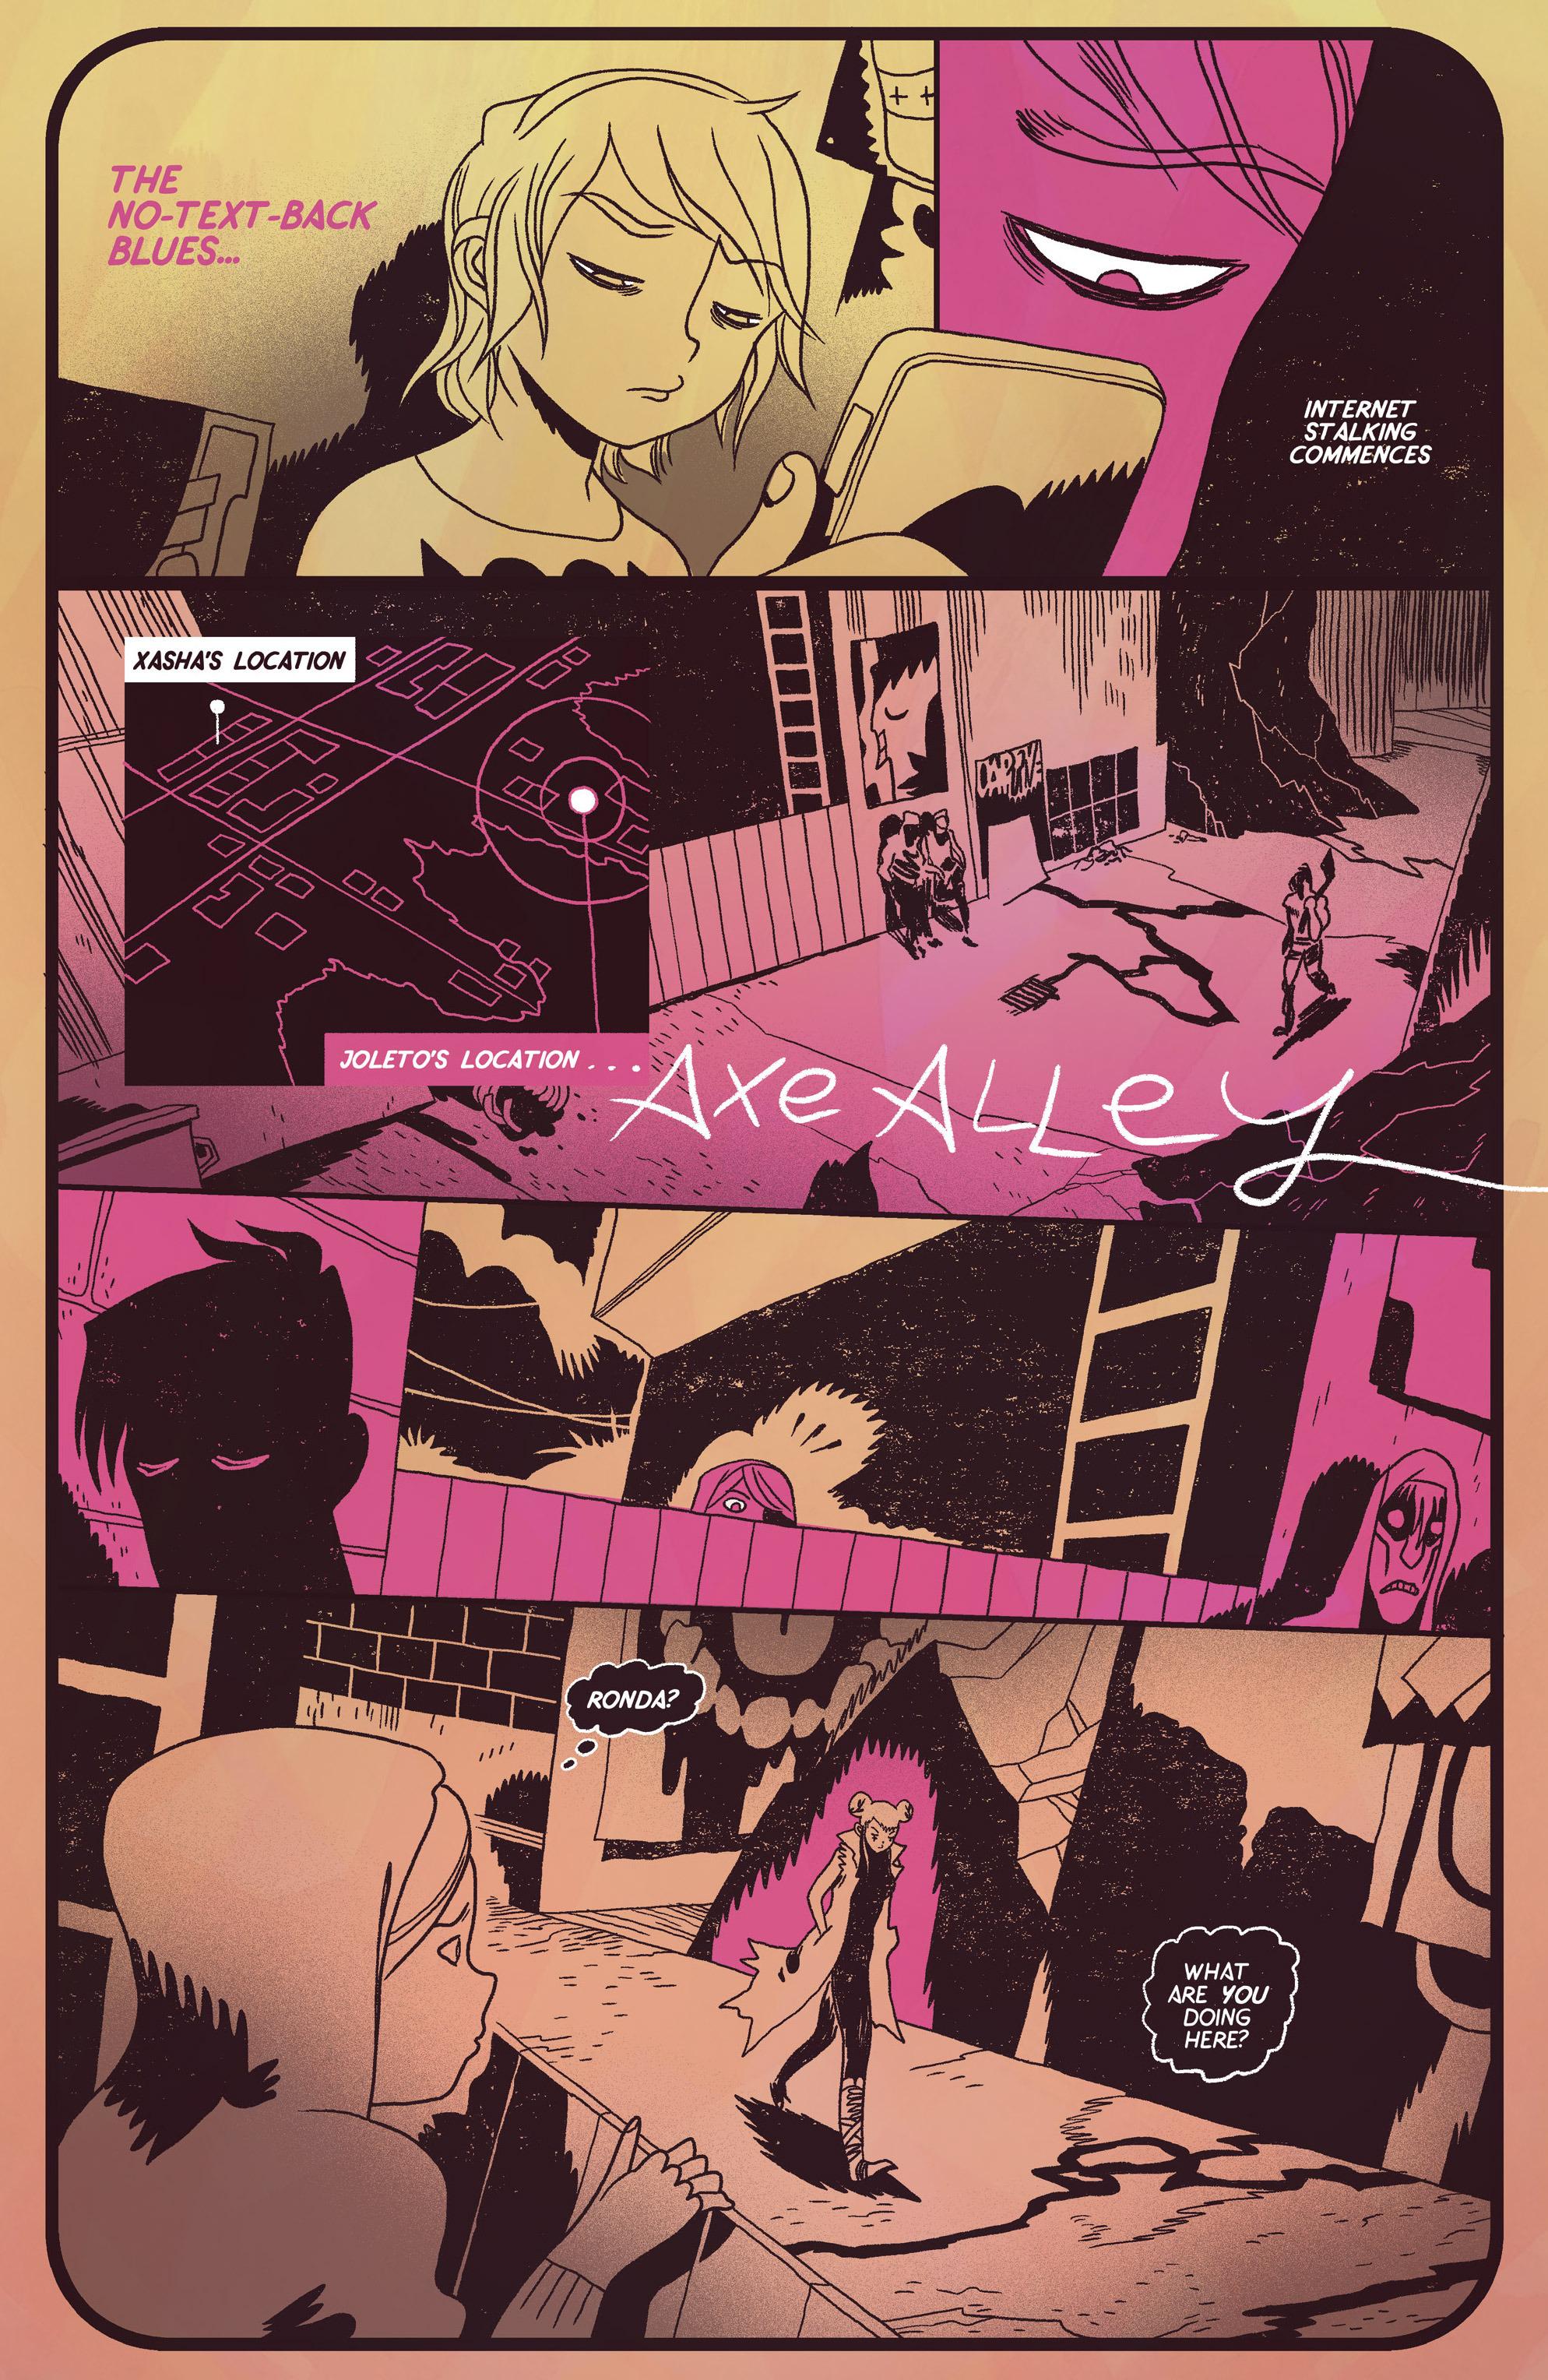 Read online Sun Bakery comic -  Issue #3 - 28